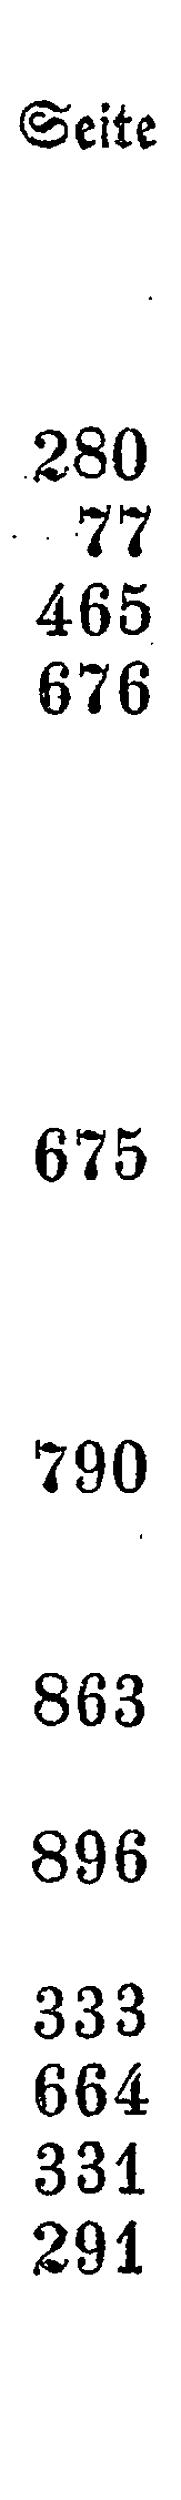 [merged small][merged small][ocr errors][ocr errors][ocr errors][ocr errors][ocr errors][ocr errors]